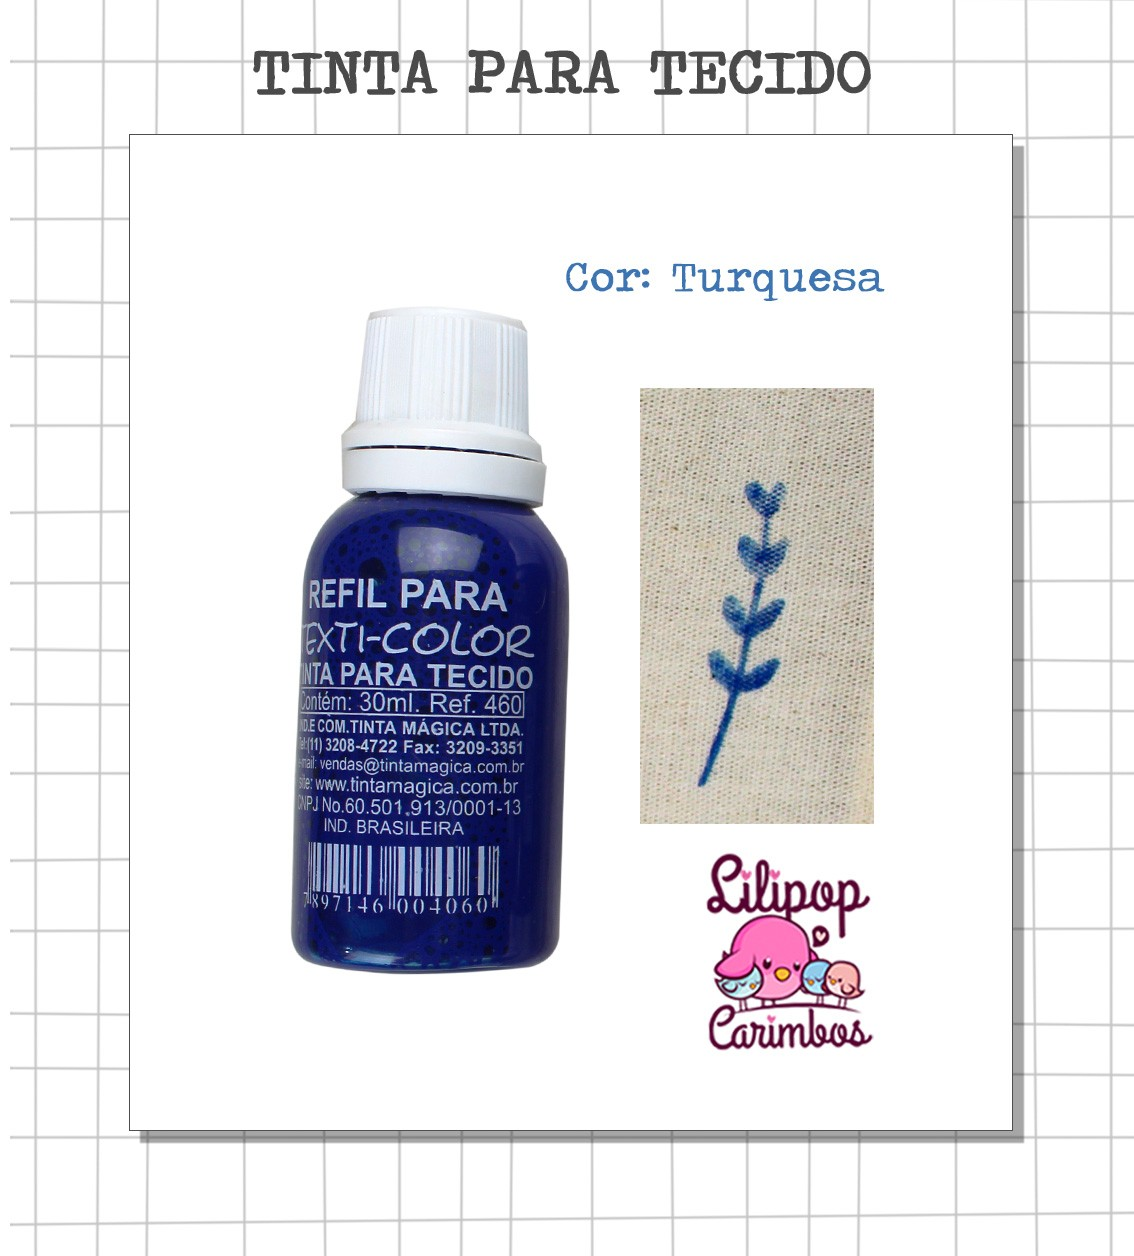 Kit de Tinta para tecido - Turquesa + almofada sem tinta